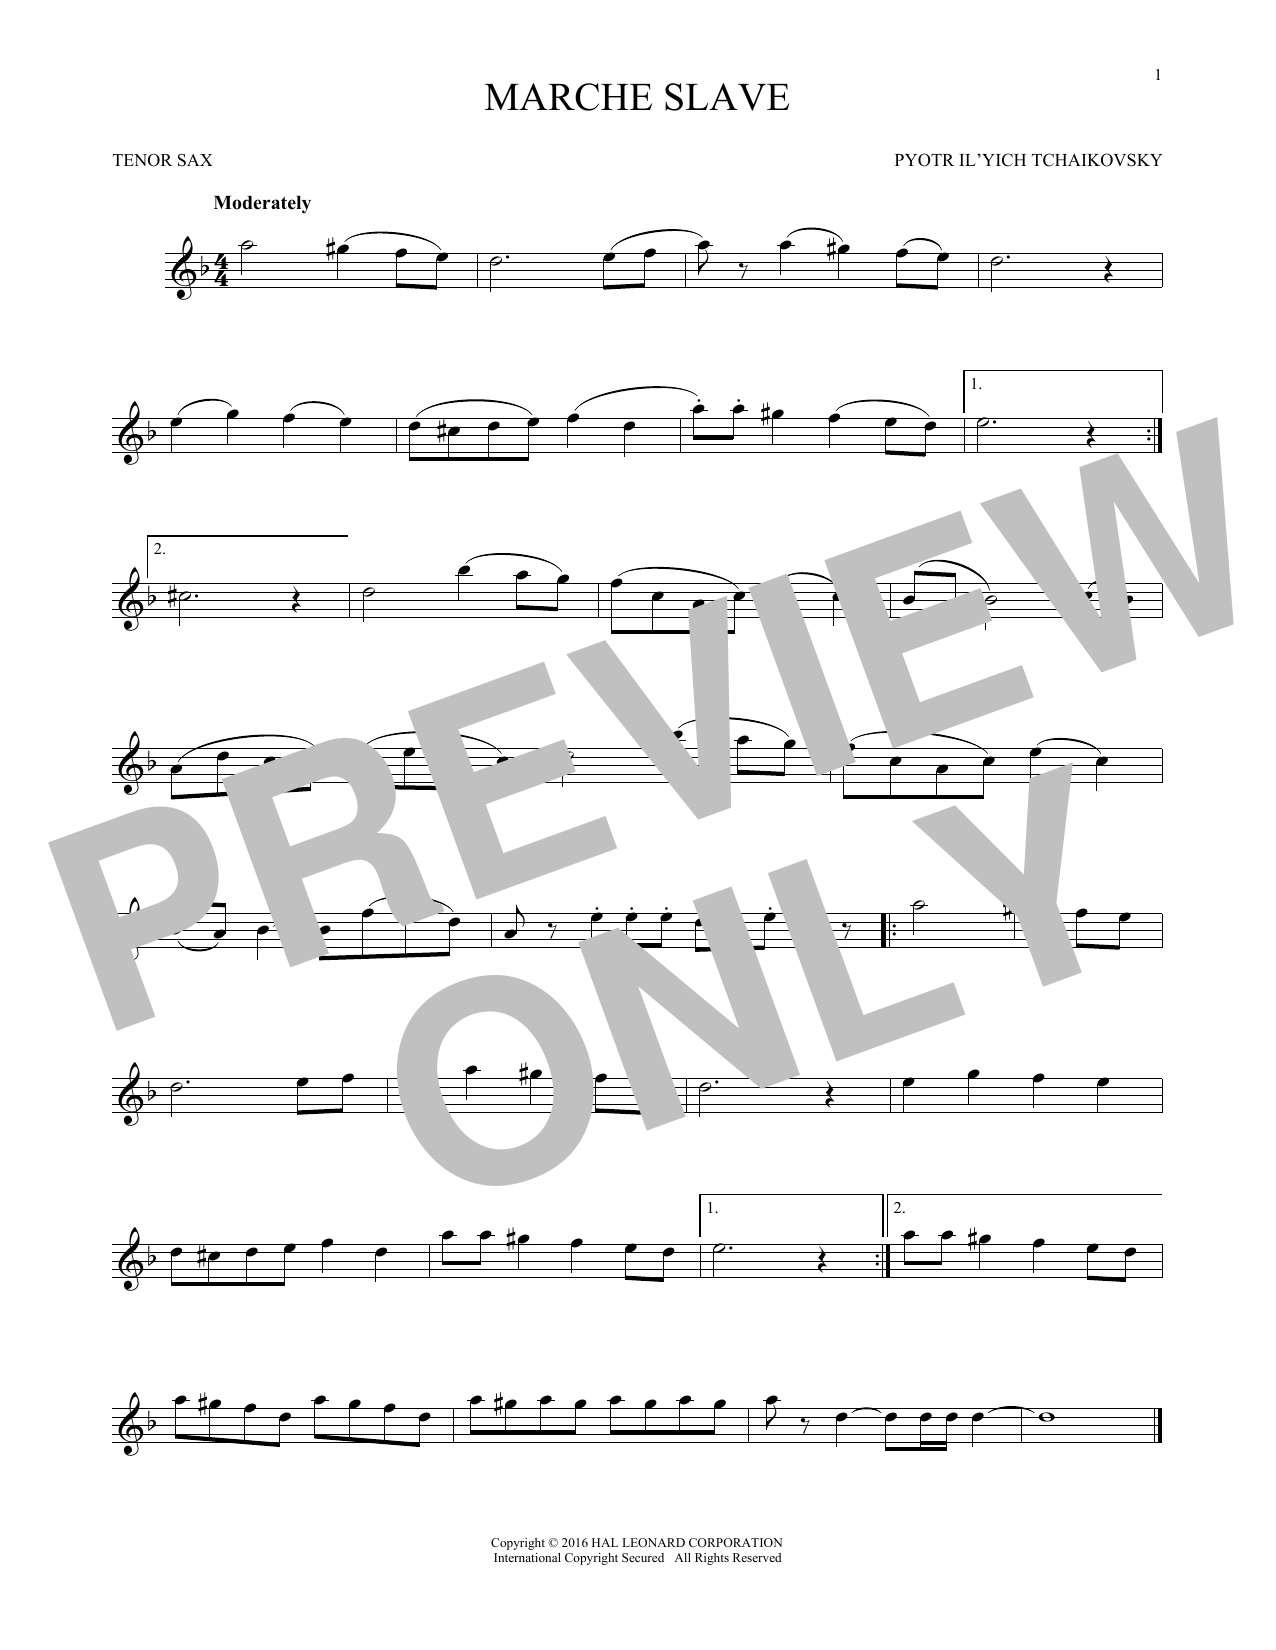 Marche Slav, Op. 31 (Tenor Sax Solo)